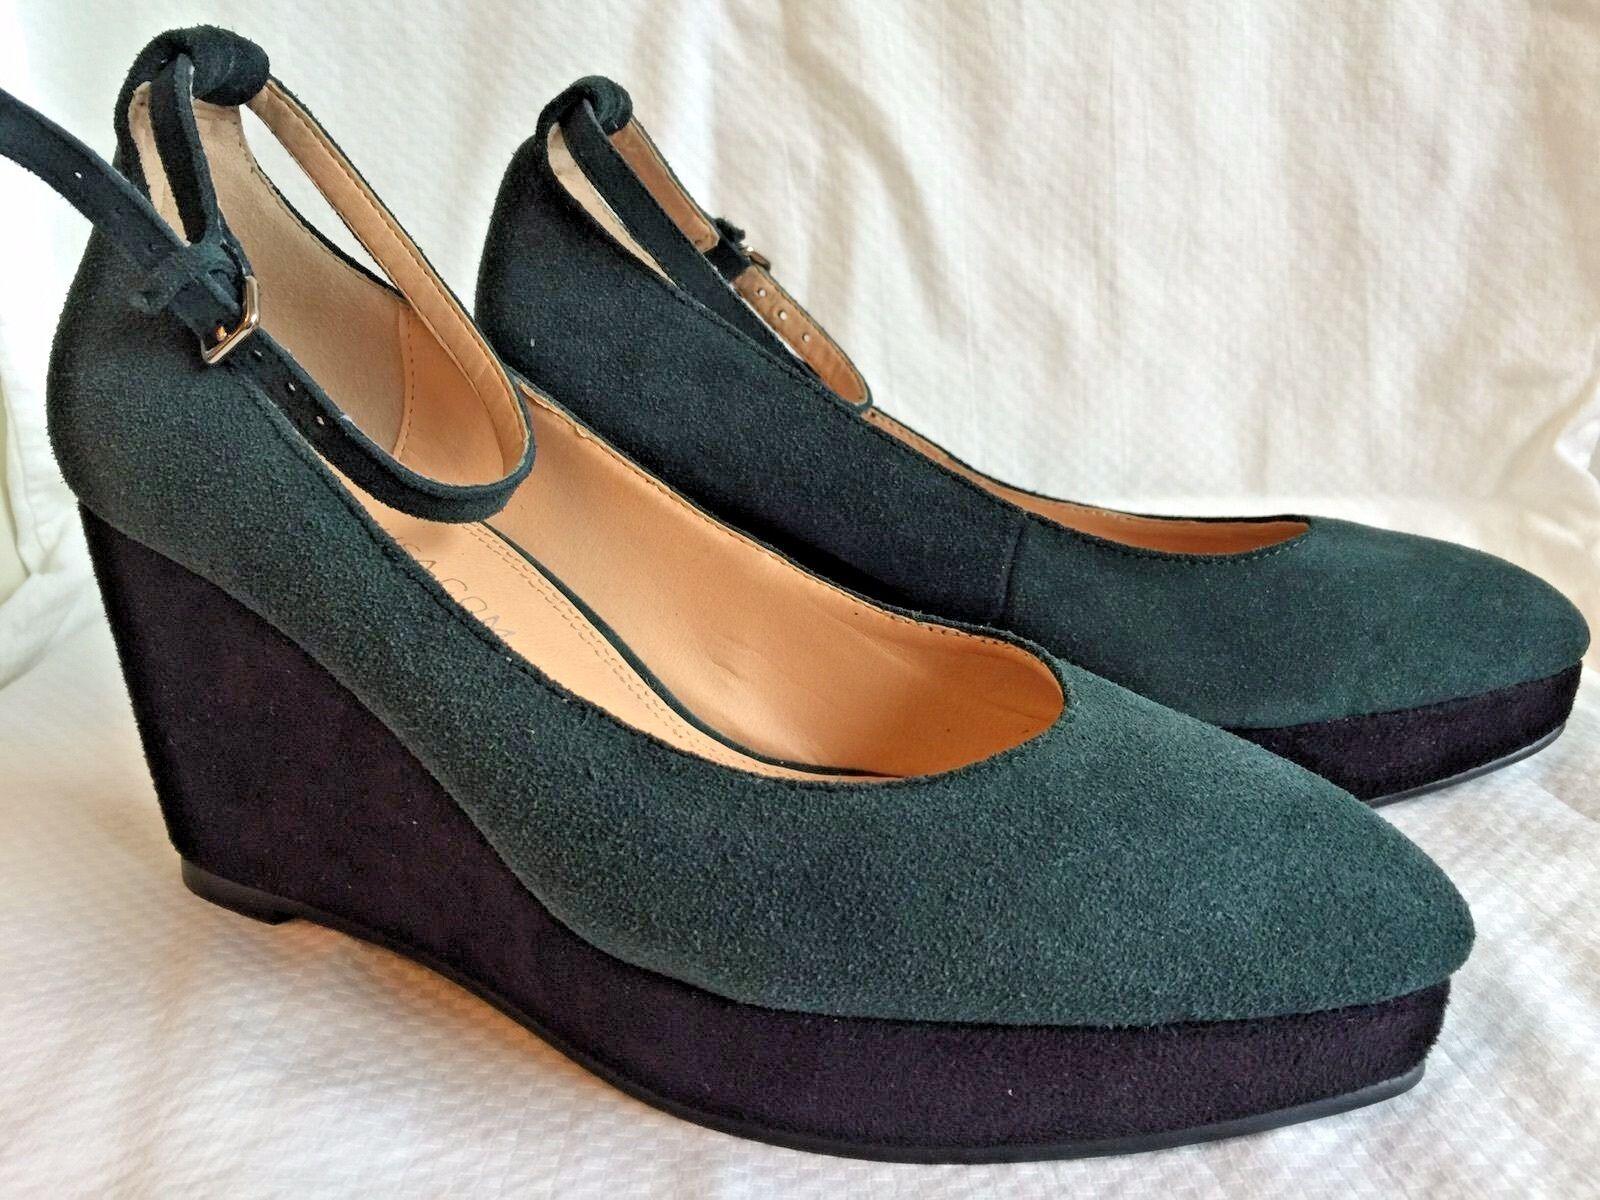 ANTHROPOLOGIE Marais USA Women's shoes 7 Green Suede Platform Wedge Ankle Strap